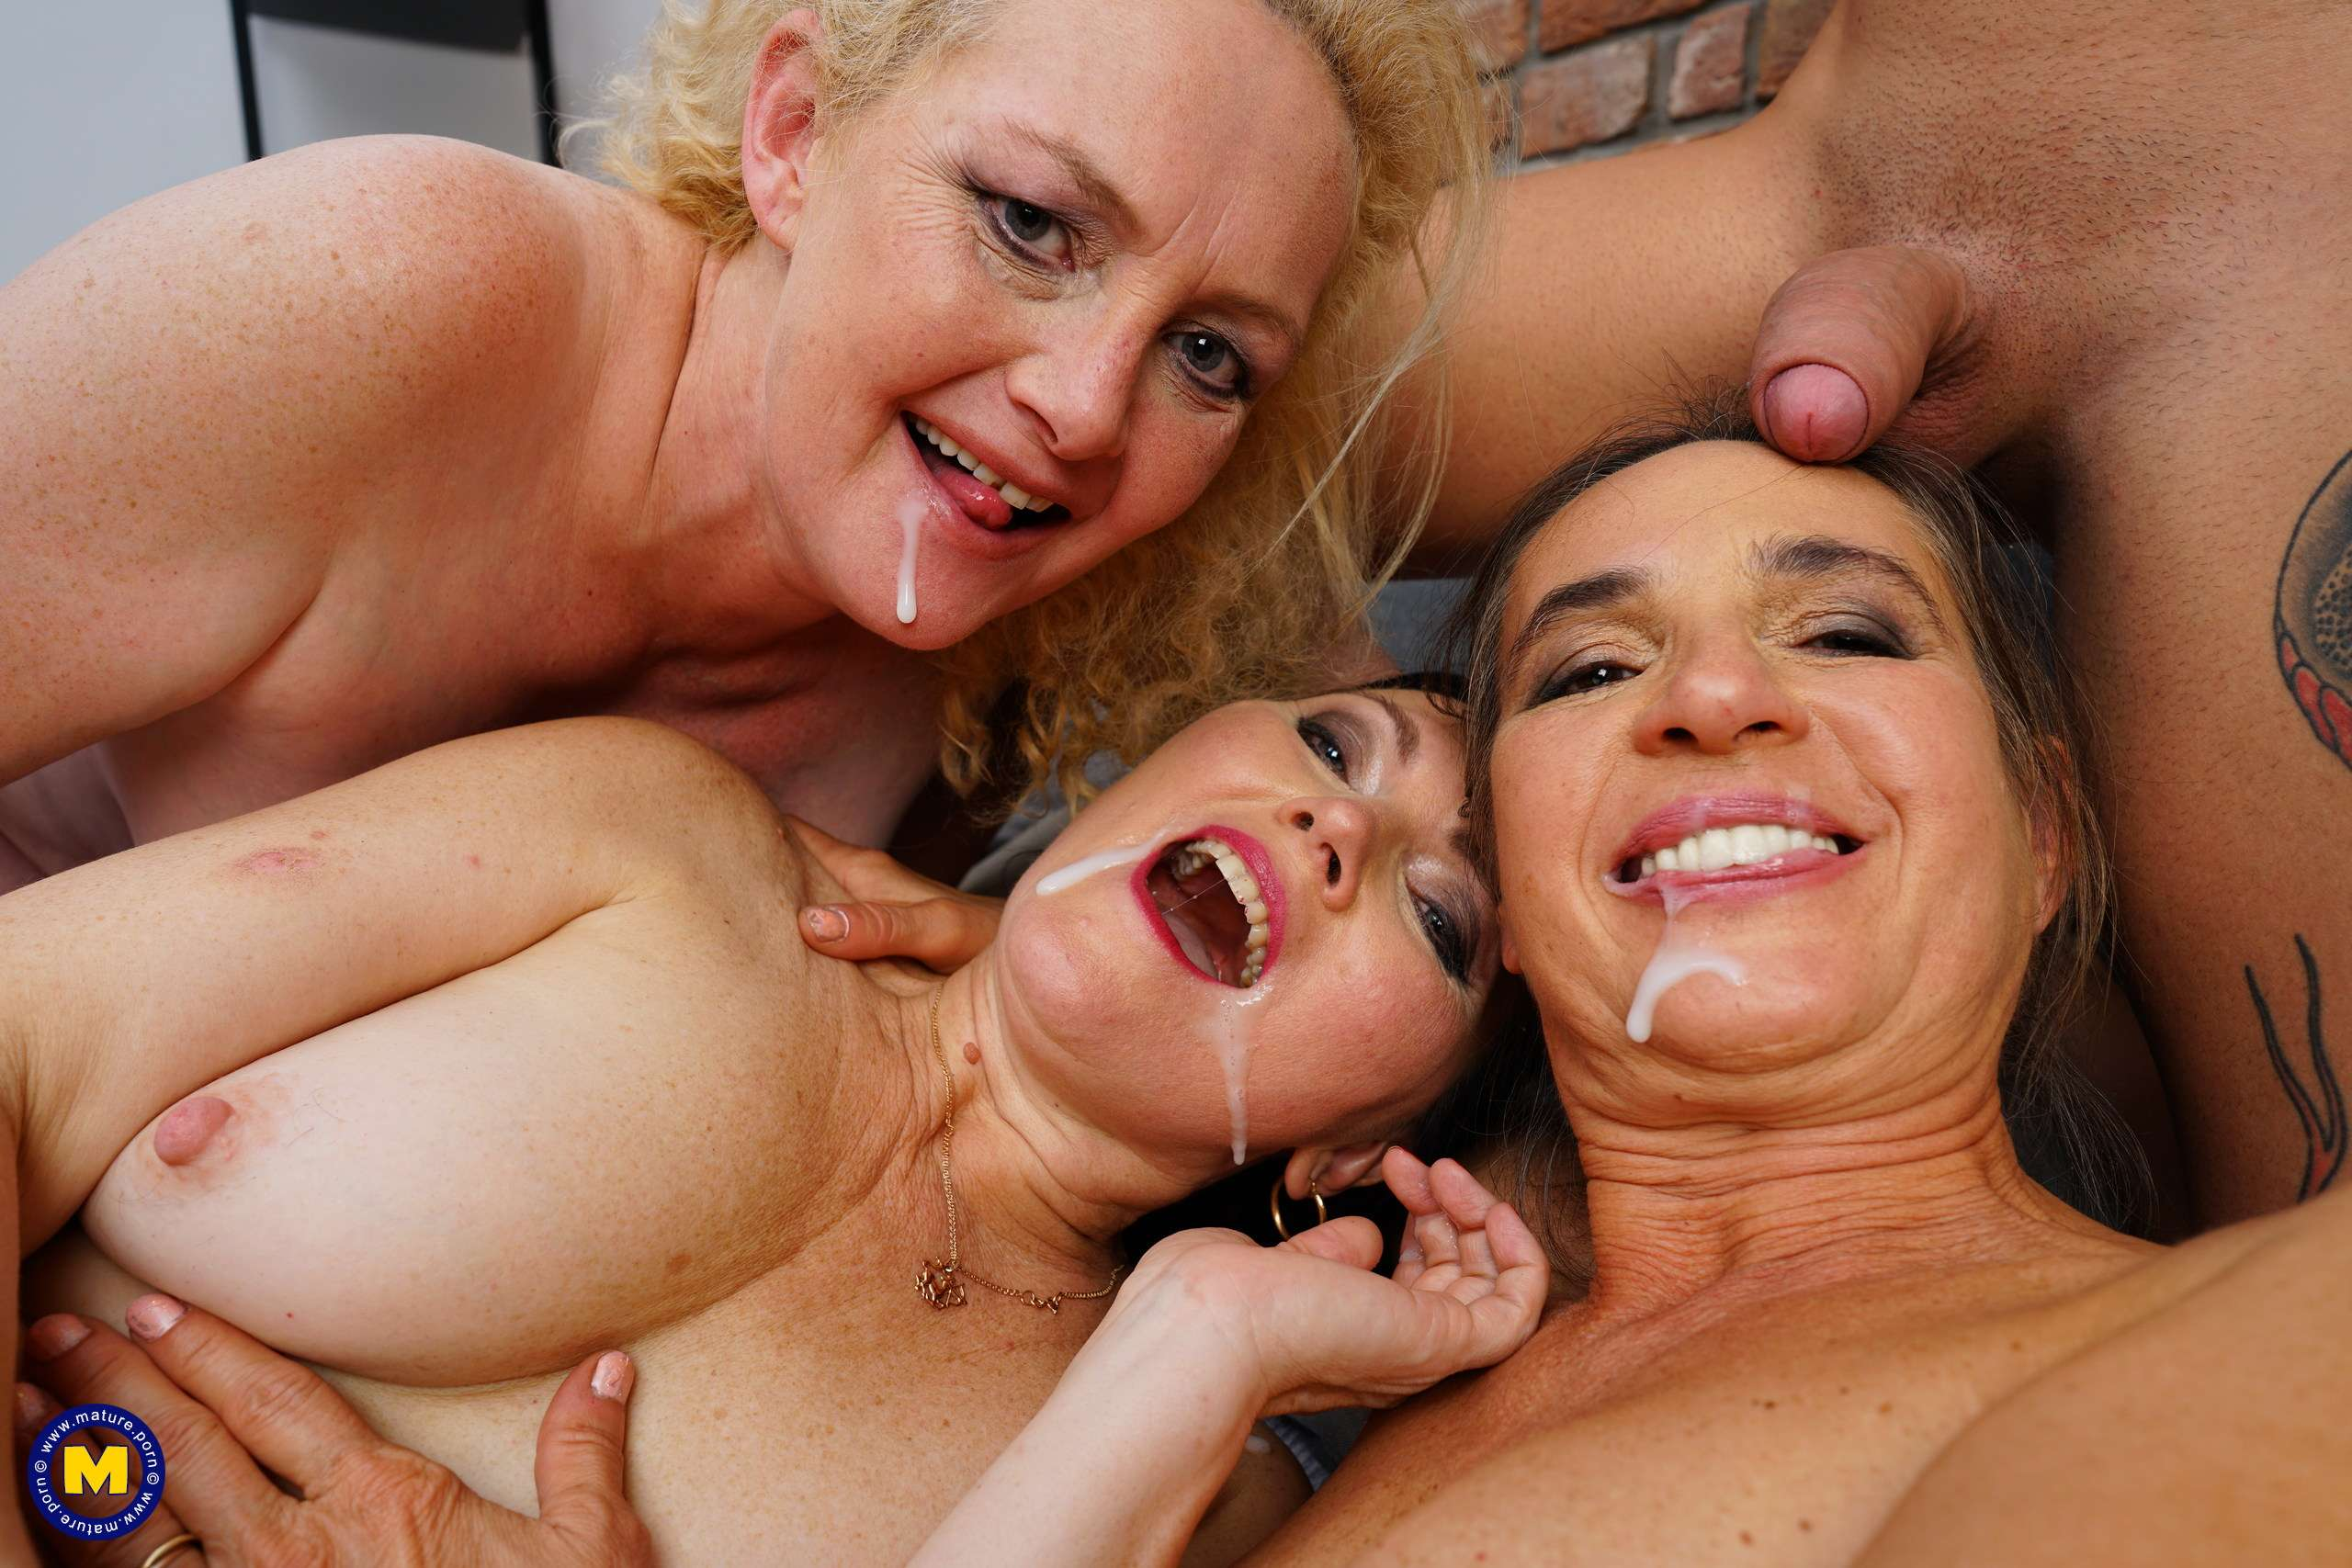 Three sluts made their friend cum hard